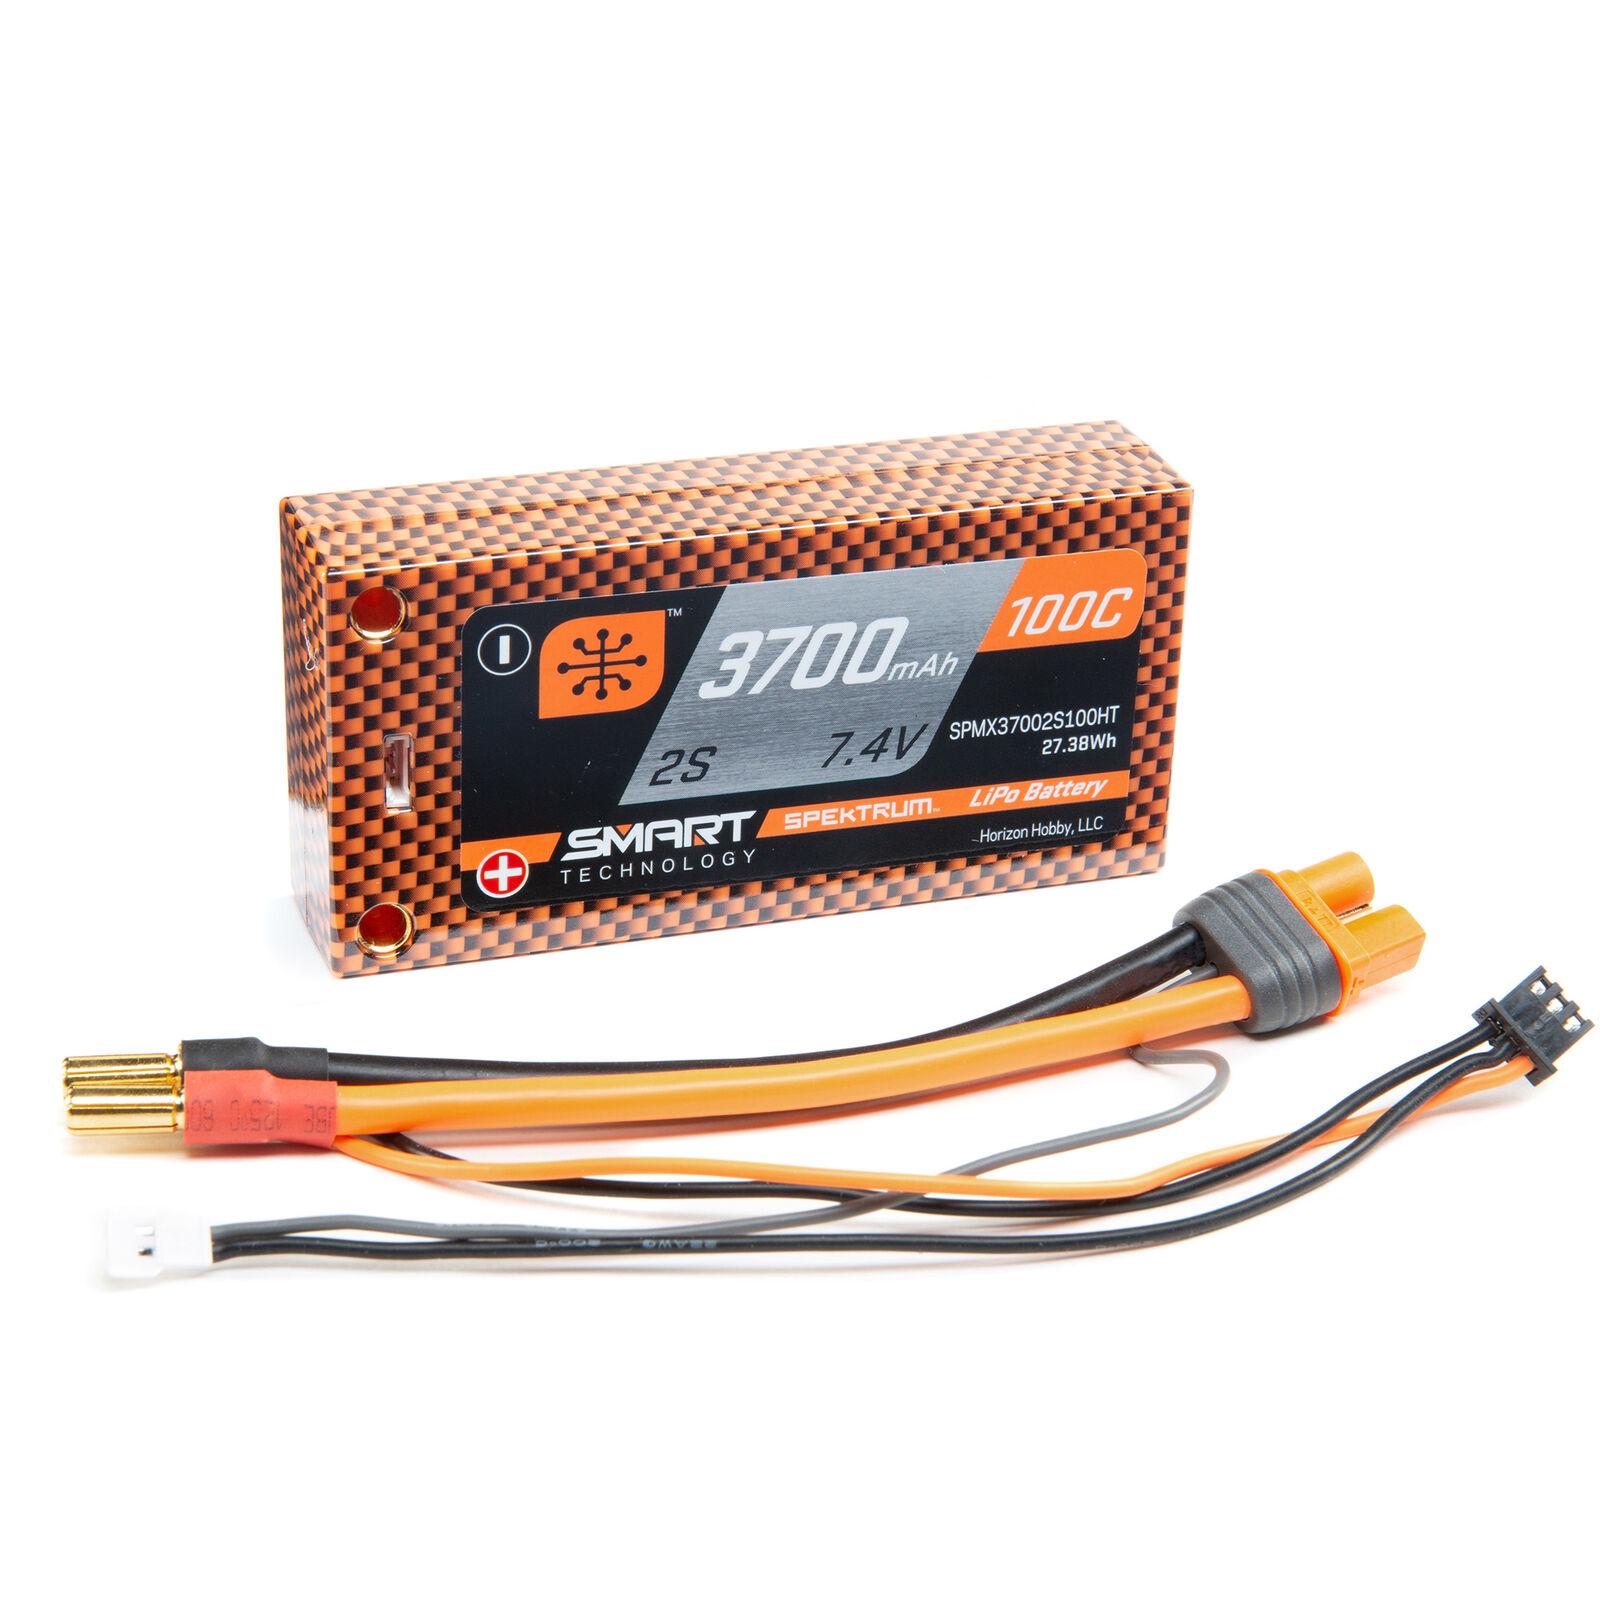 7.4V 3700mAh 2S 100C Race Shorty Hardcase Smart LiPo Battery: Tubes, 5mm